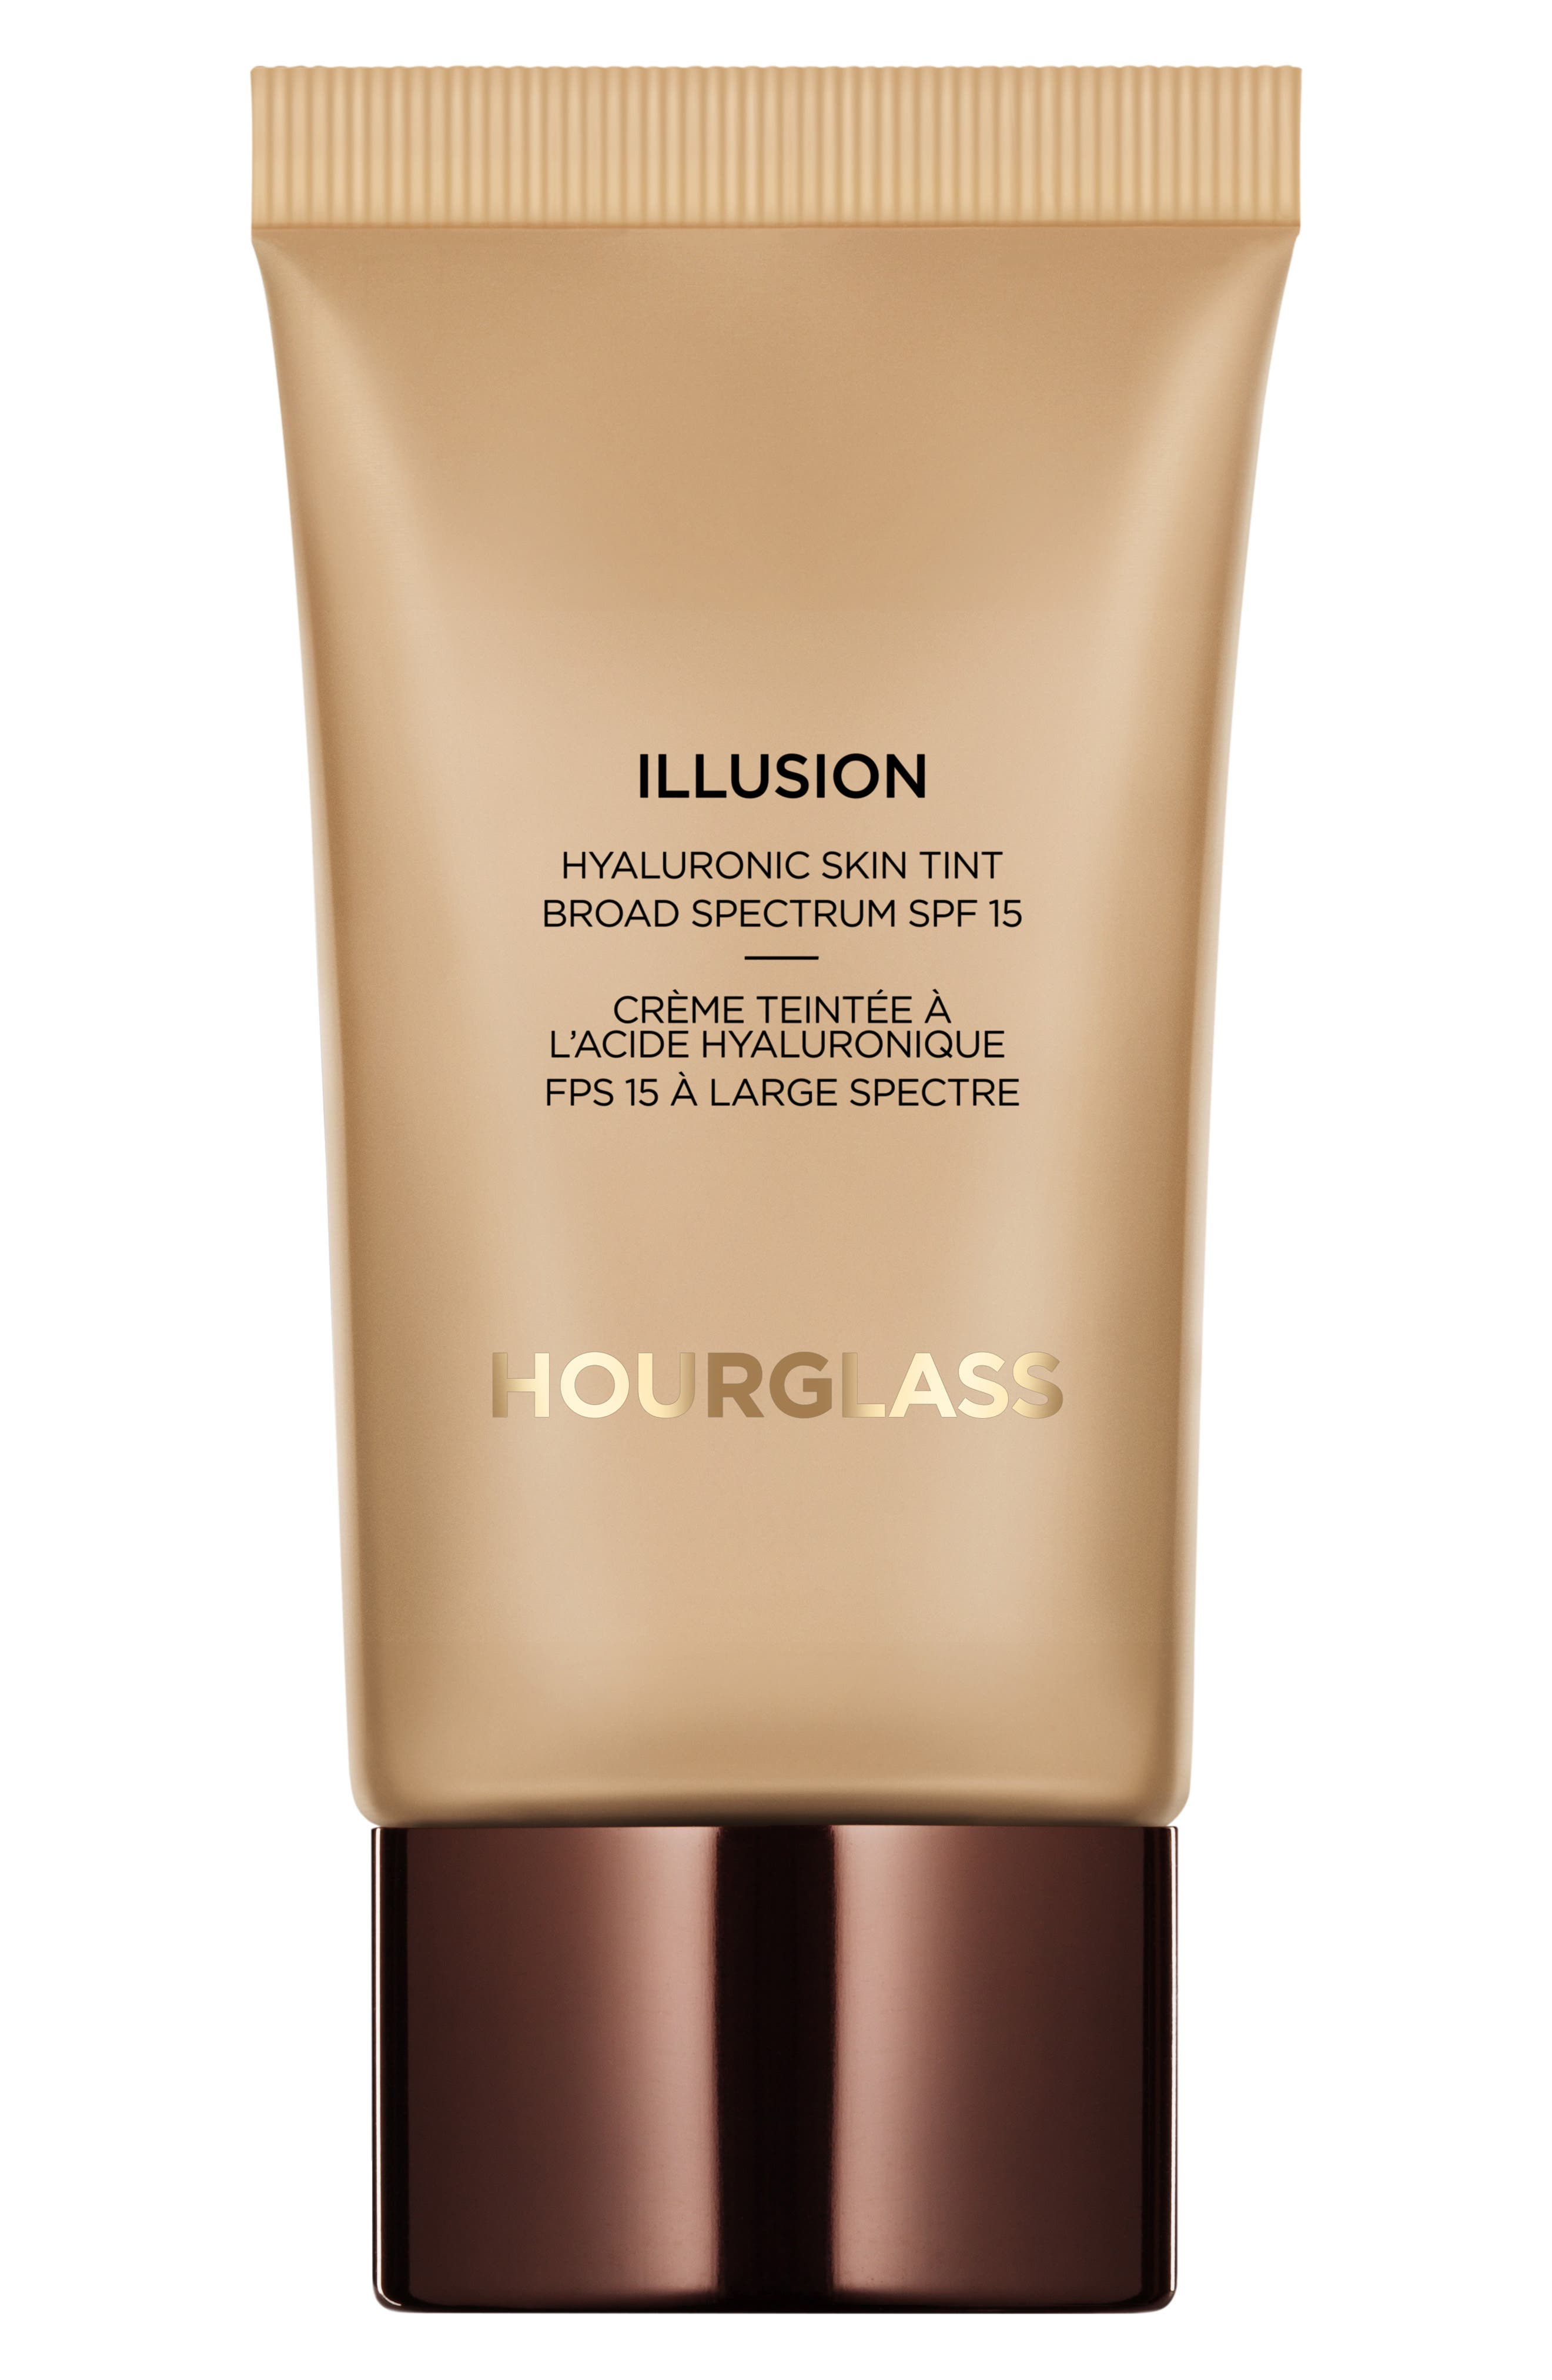 Illusion Hyaluronic Skin Tint Foundation